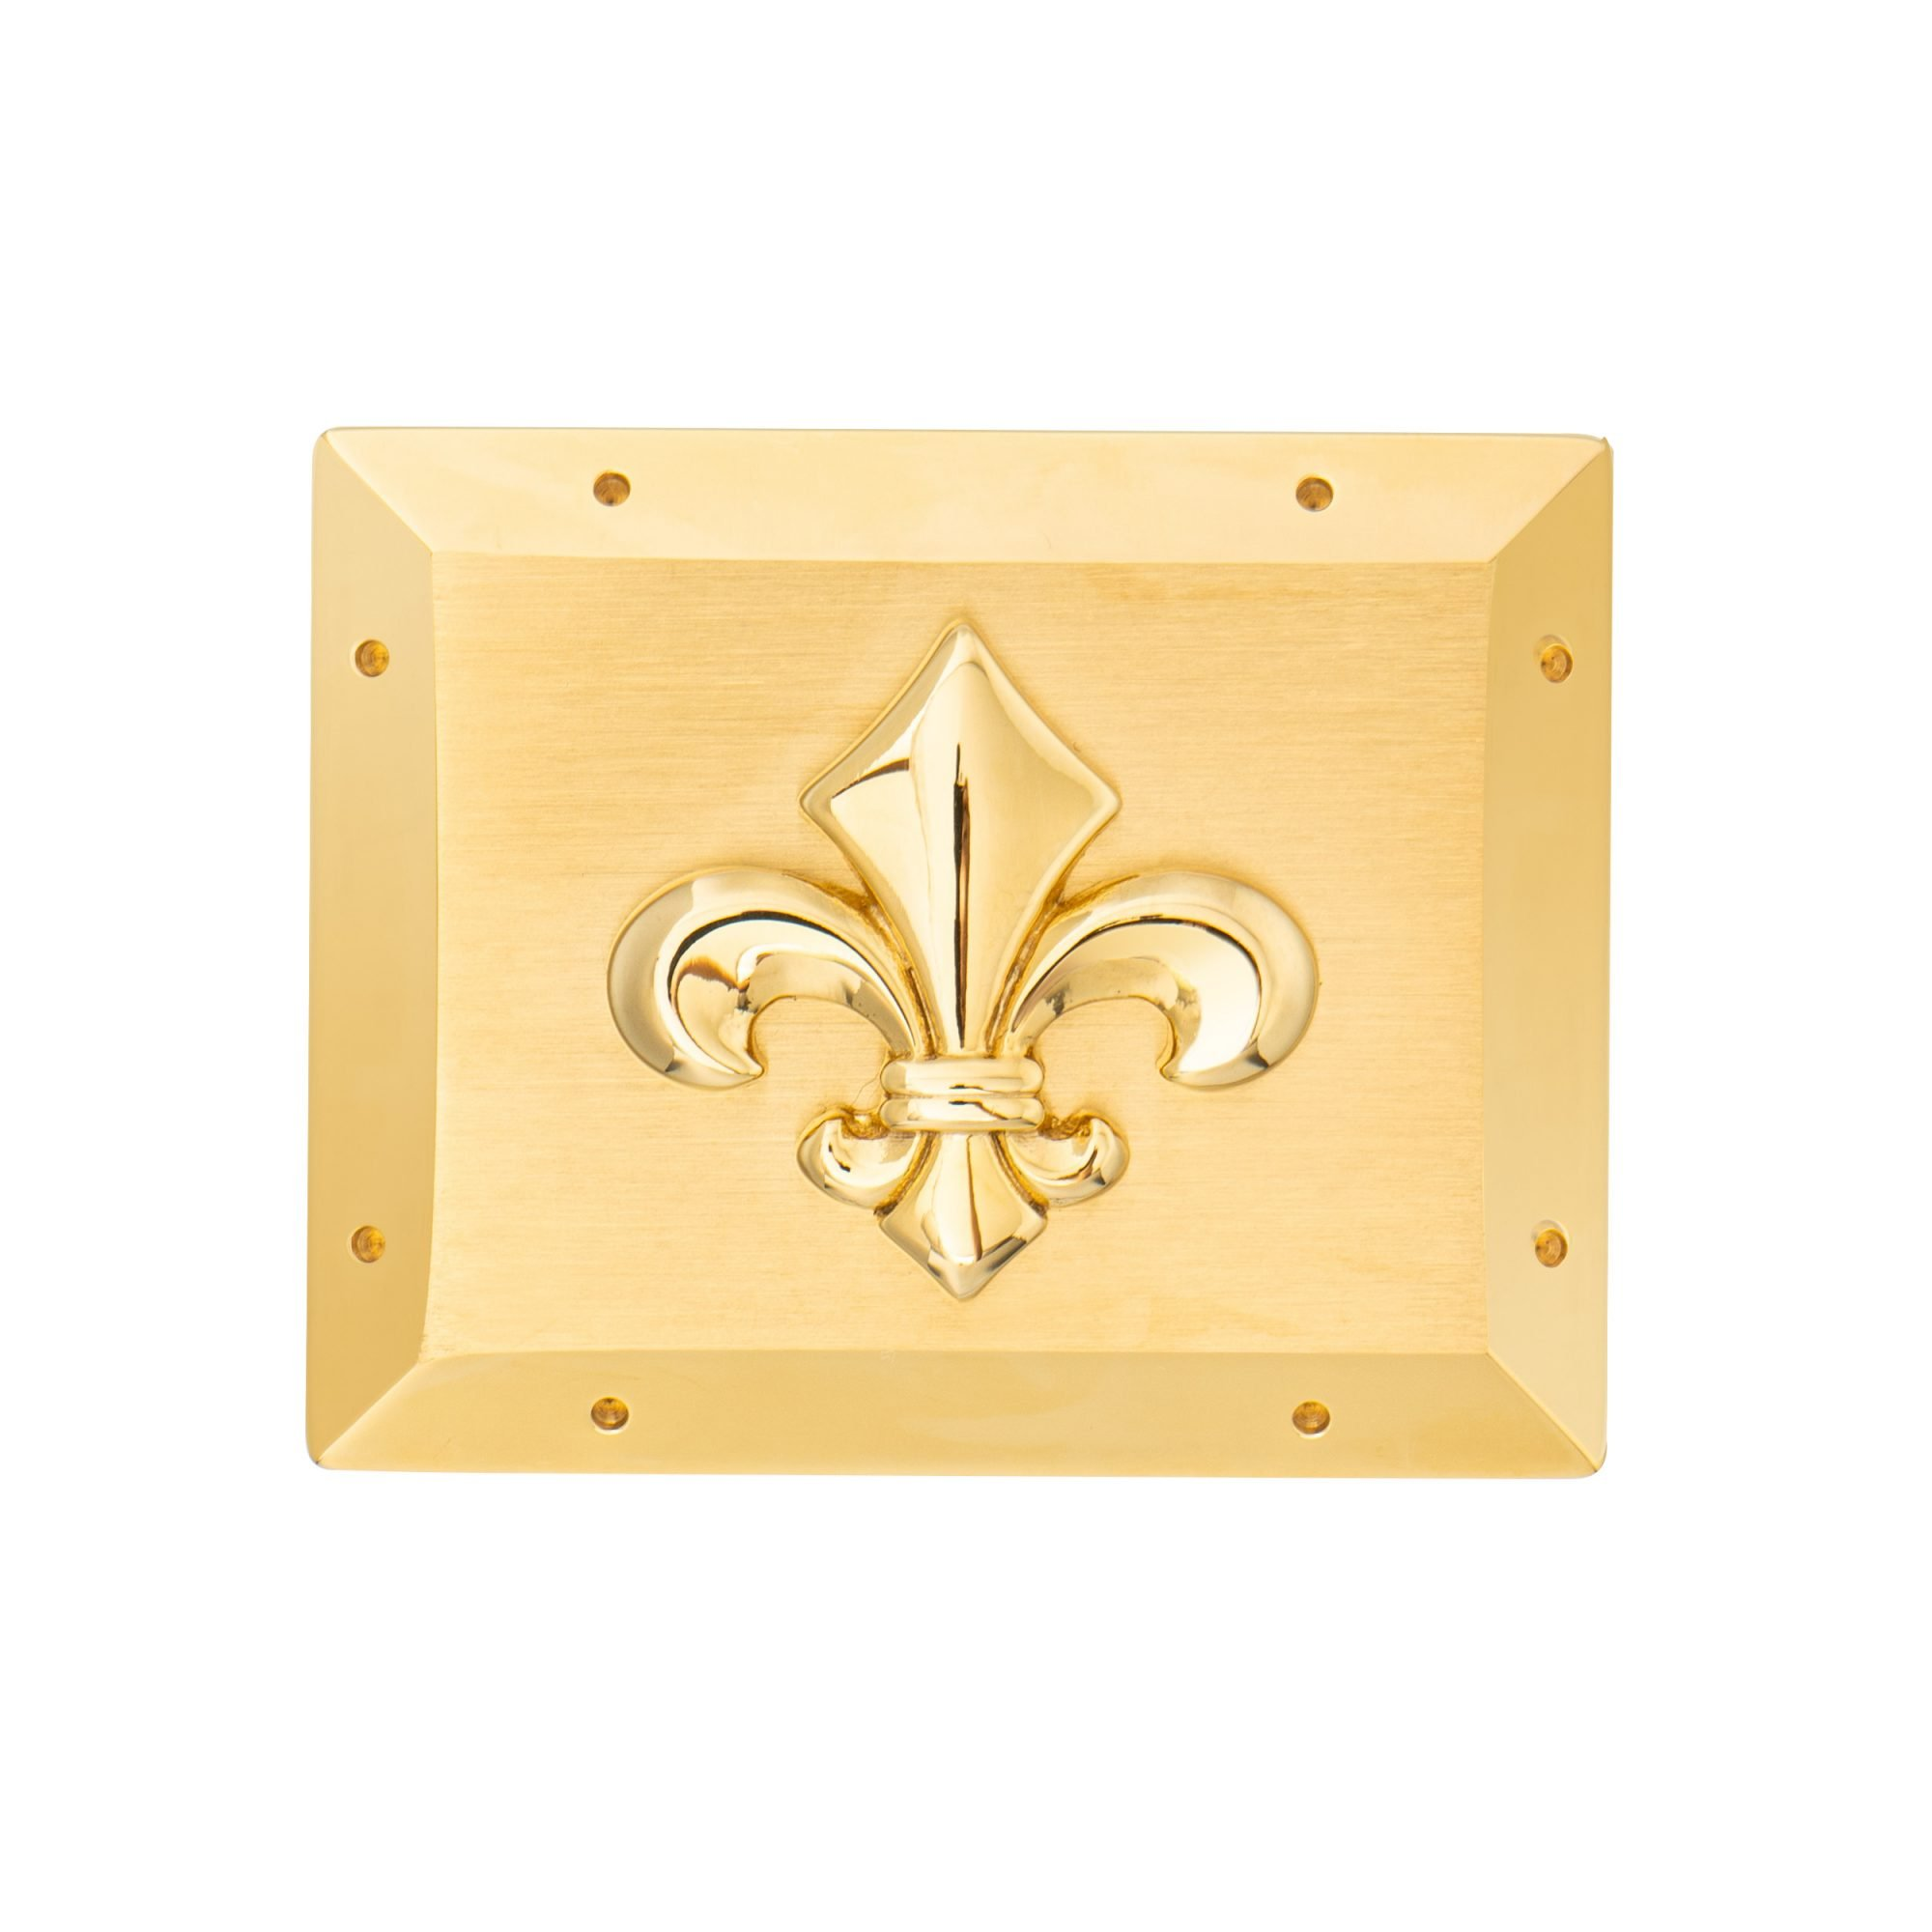 VIKTOR ALEXANDER 38MM STAINLESS STEEL BELT BUCKLE FLEUR DE LIS YELLOW GOLD FRONT PROFILE